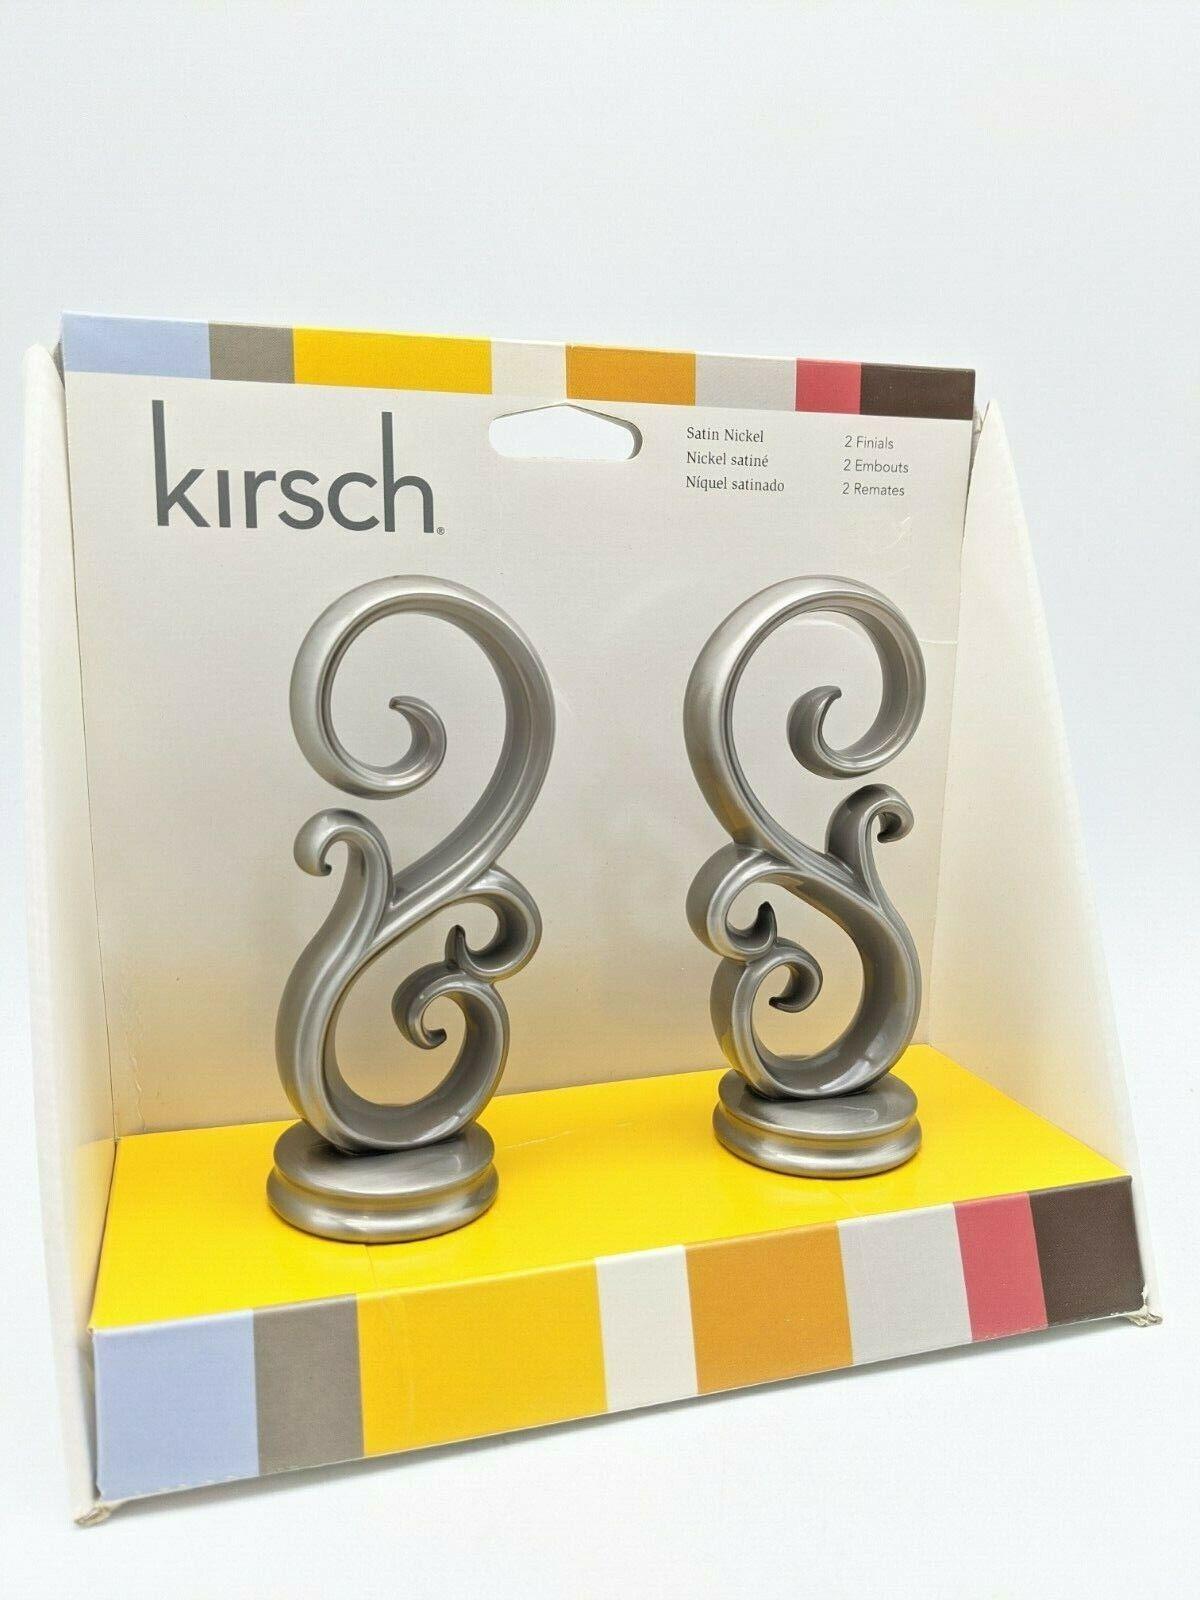 Kirsch Scroll Style Satin Nickel Metal Finials 2 Piece Set Curtain Rod Ends For Sale Online Ebay